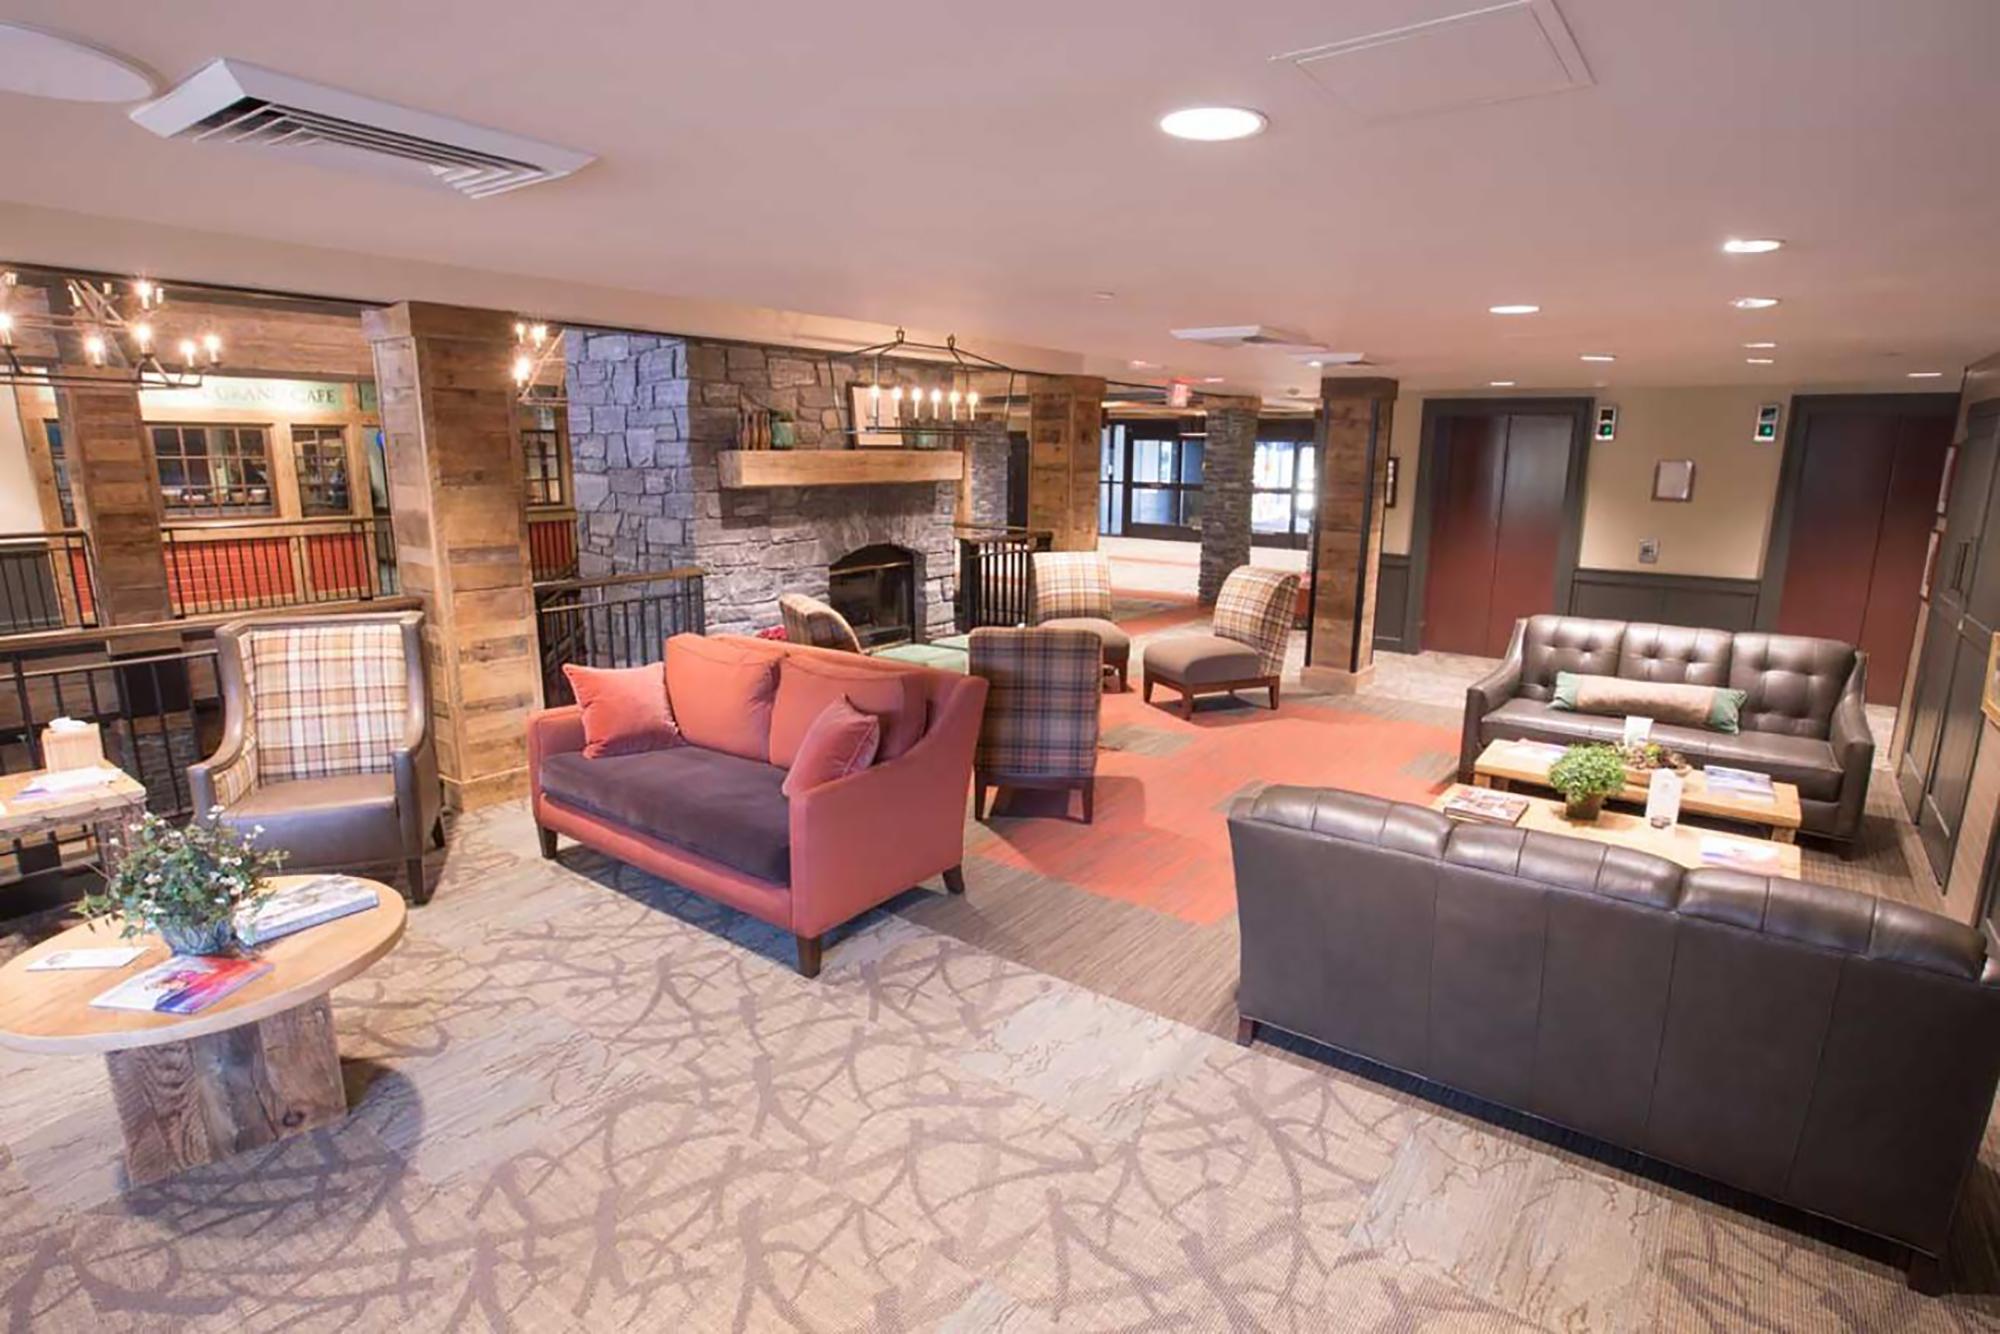 lodging in killington vt mountainside vacations. Black Bedroom Furniture Sets. Home Design Ideas